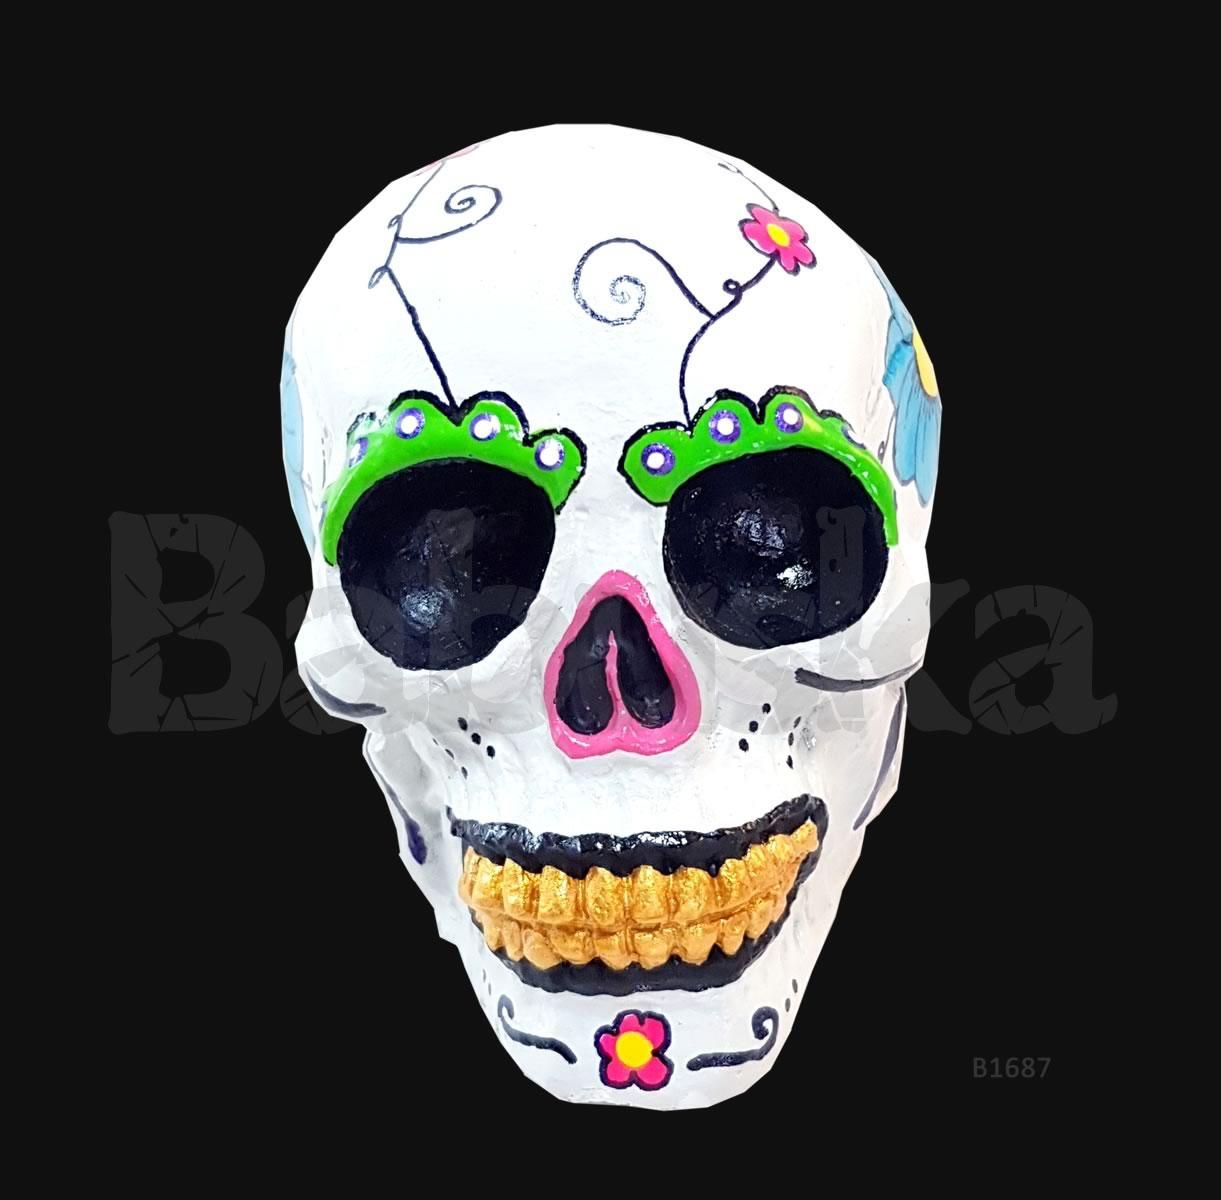 Calavera mexicana - Calavera Hermes